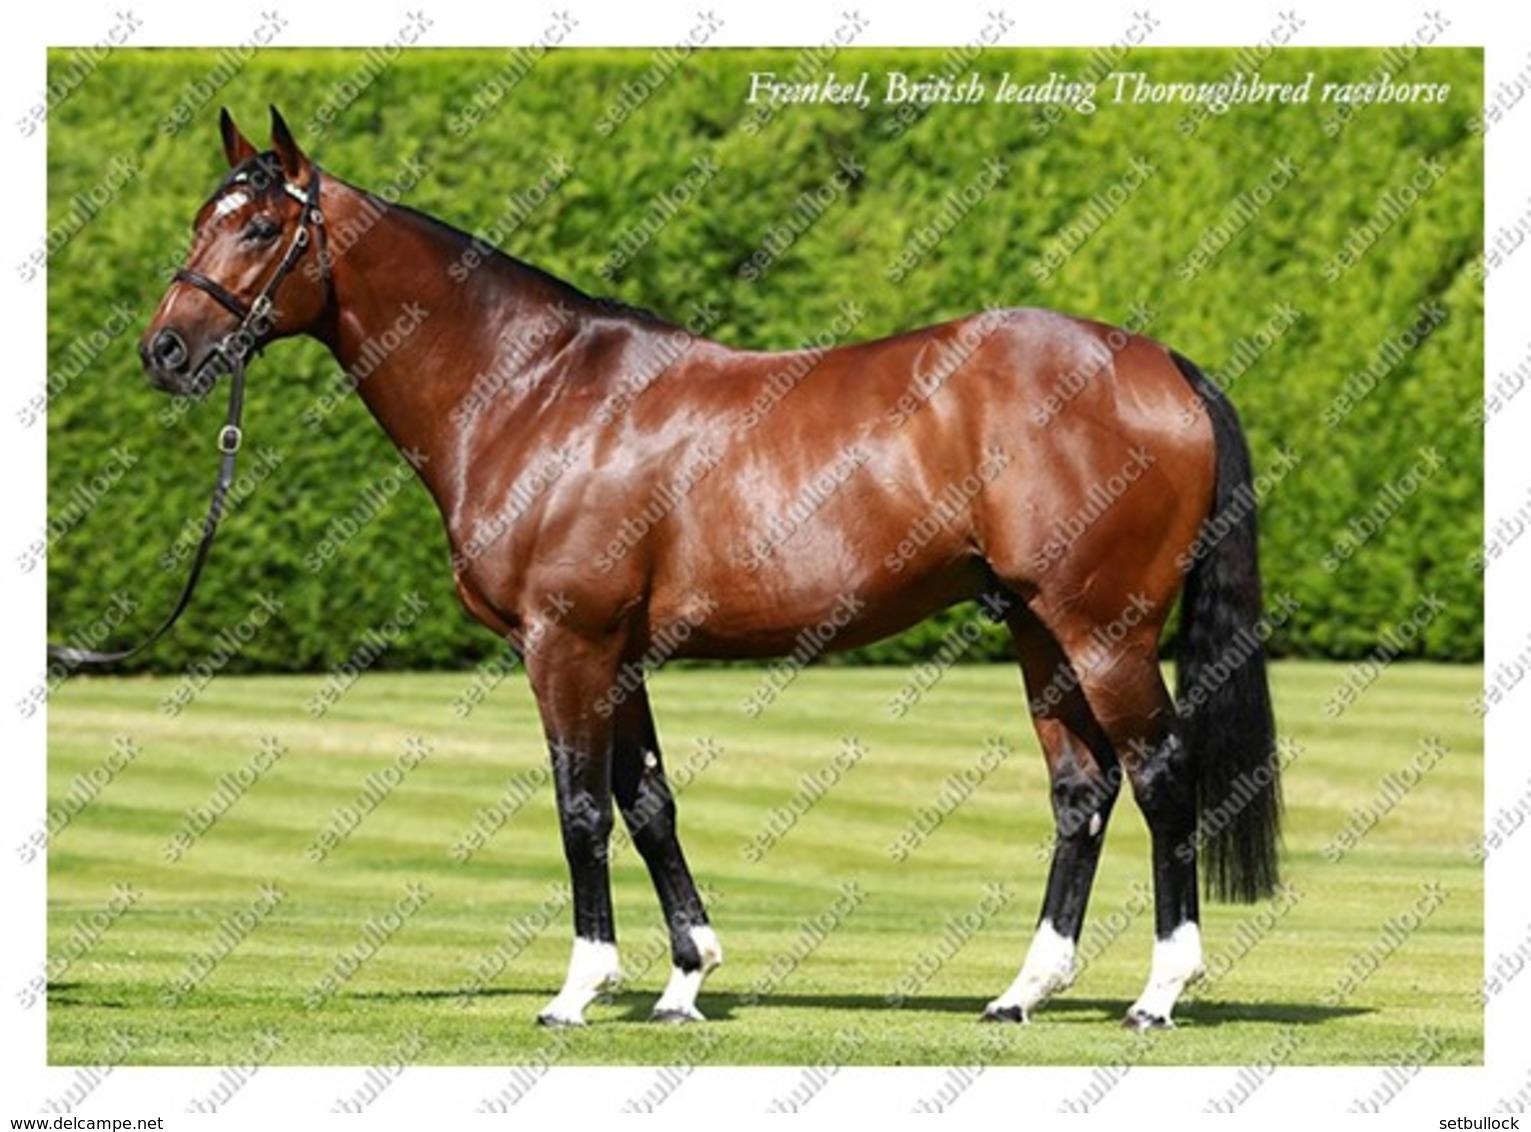 Ukraine   Postcard   Frankel   Leading Thoroughbred Racehorse   Horse - Chevaux